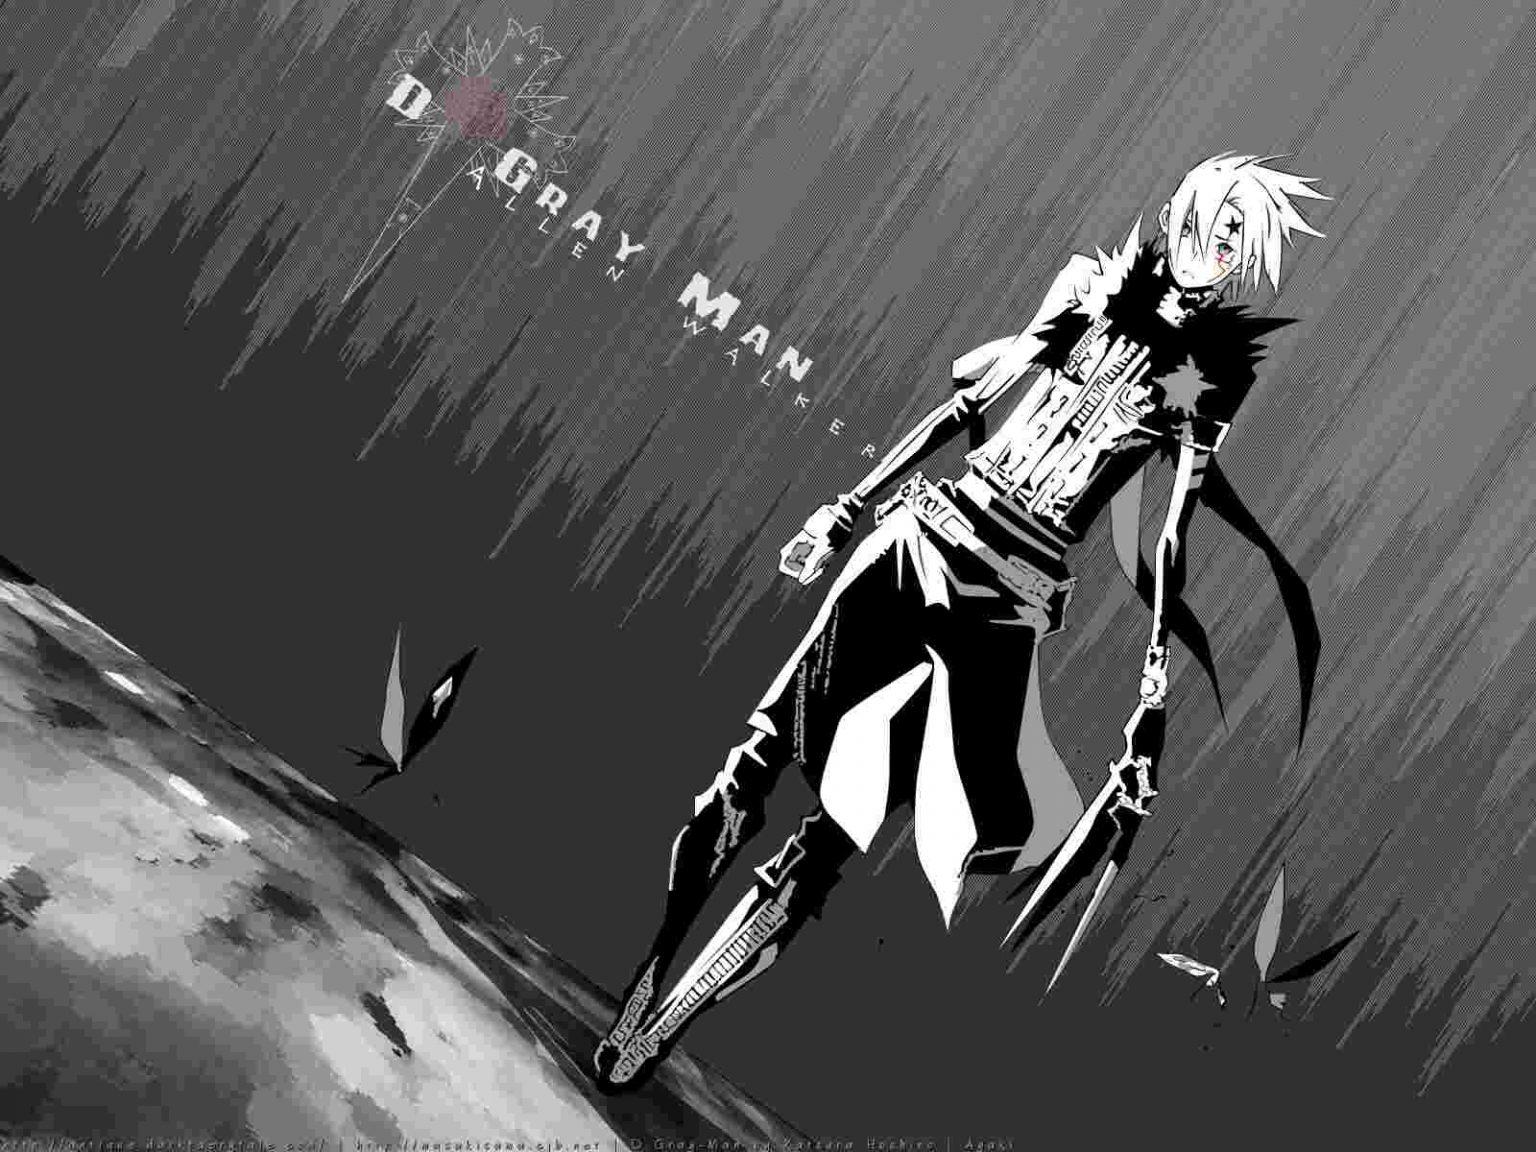 D. Gray Man Глава 241 Невинность атакует ману